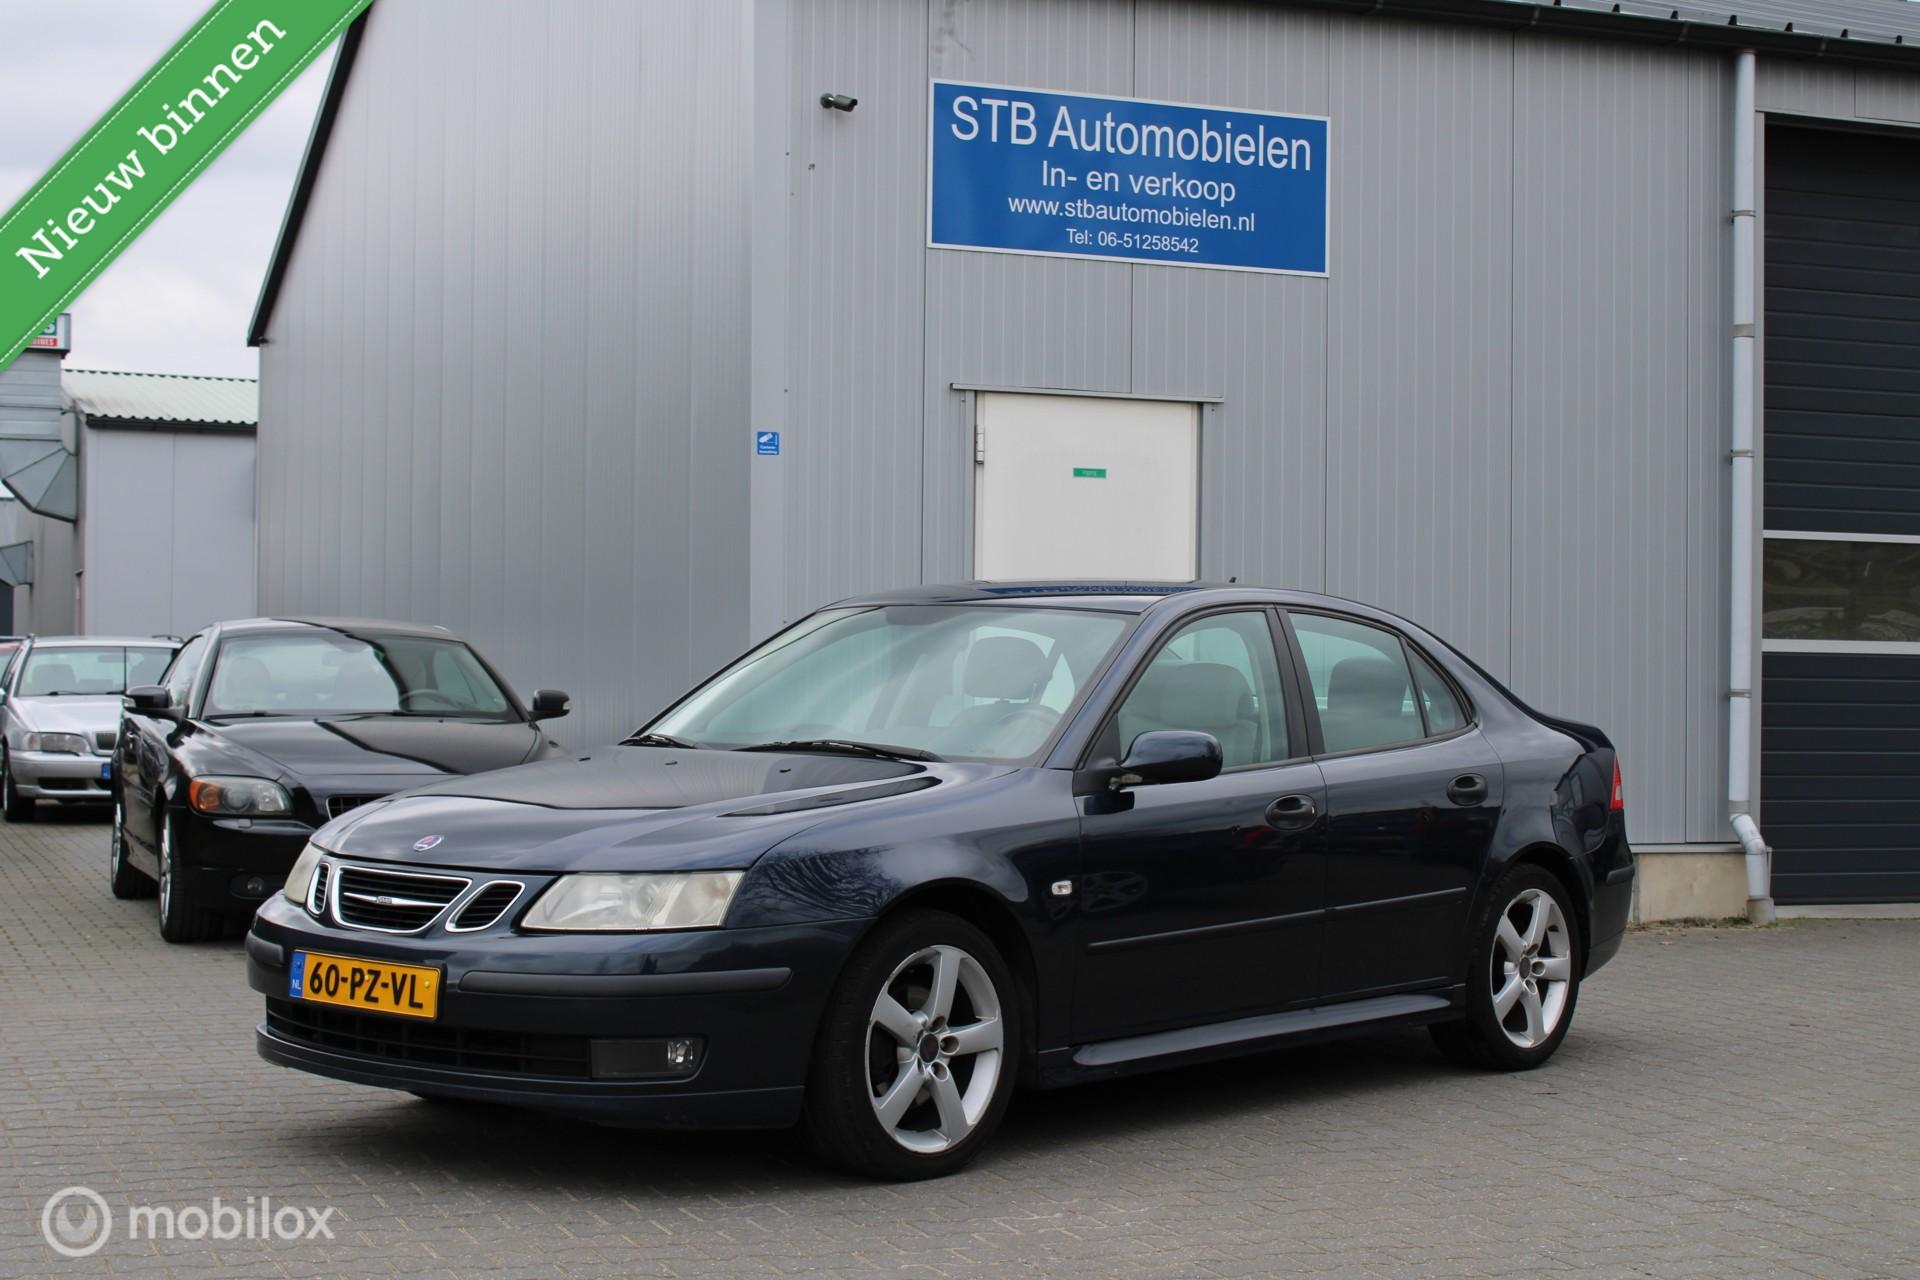 Saab 9-3 Sport Sedan 1.8t Linear, Automaat, Youngtimer